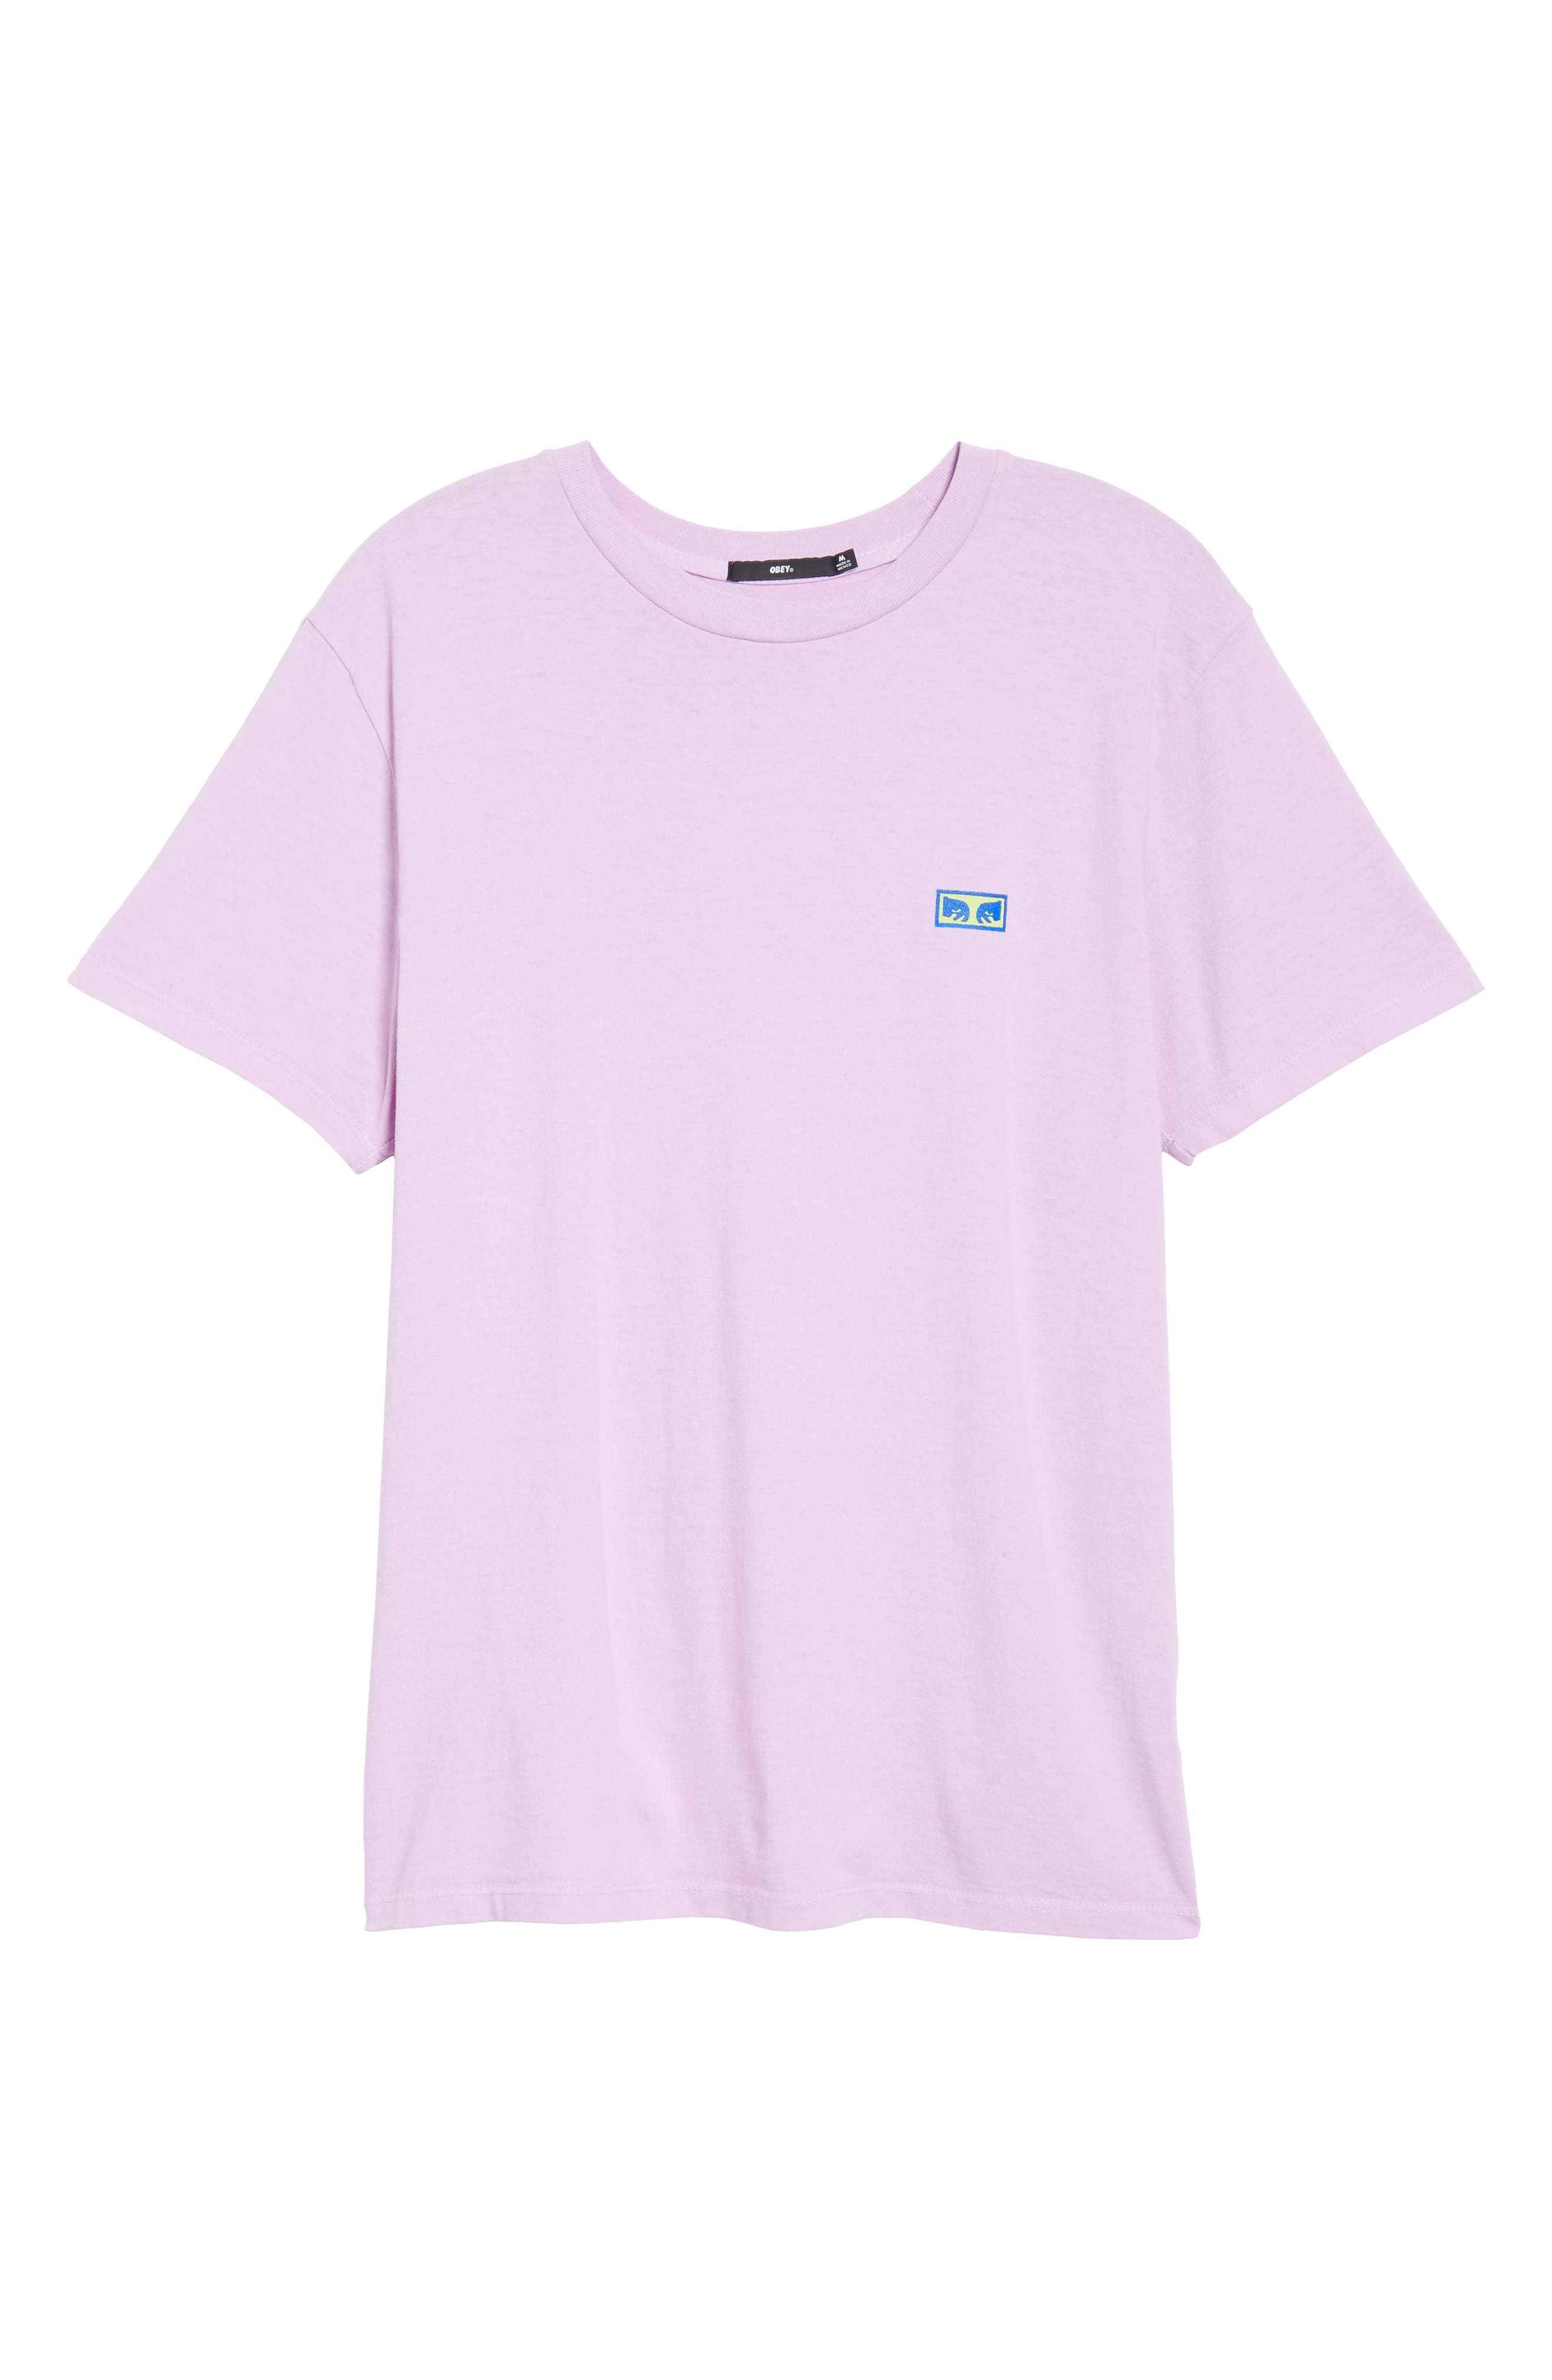 Flashback Pigment Dyed T-Shirt,                             Alternate thumbnail 6, color,                             Dusty Lavender